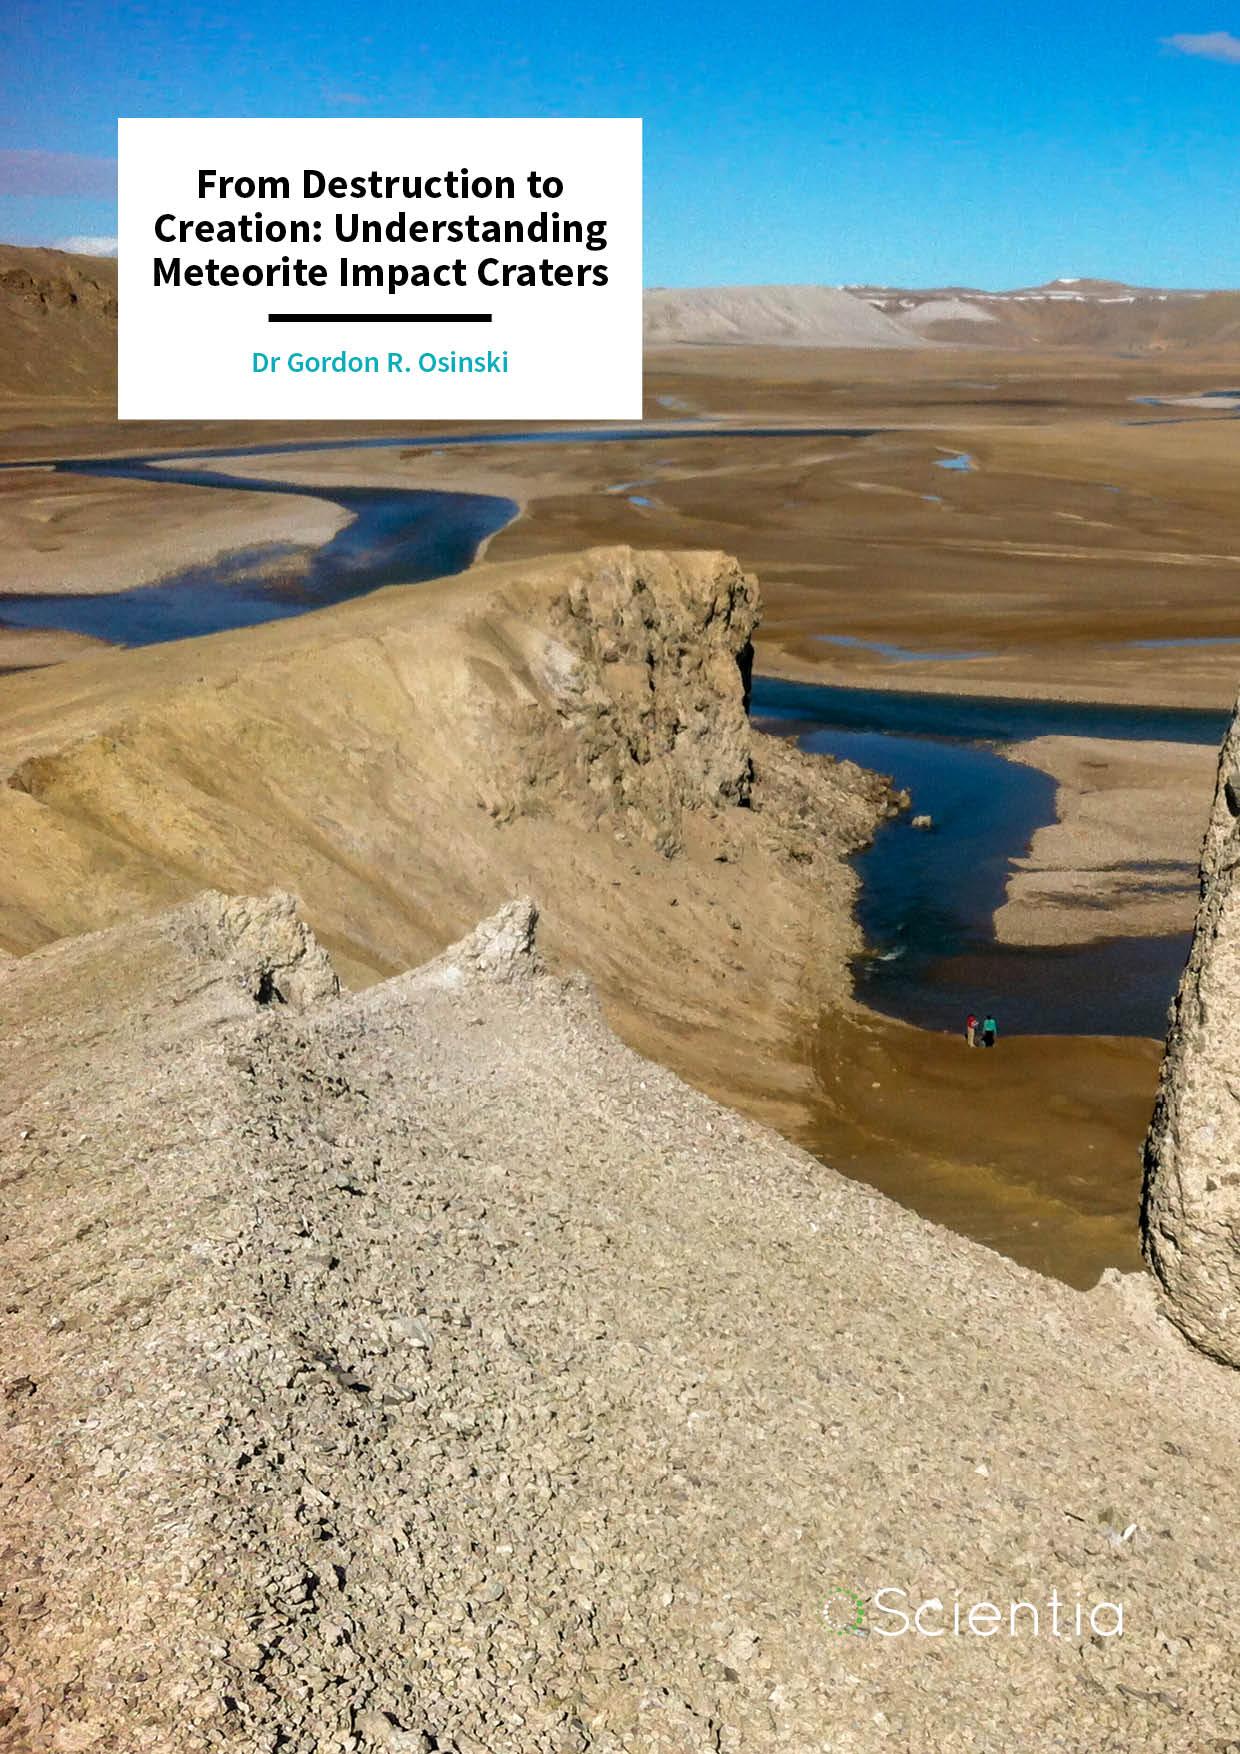 Dr Gordon 'Oz' Osinski – From Destruction to Creation: Understanding Meteorite Impact Craters